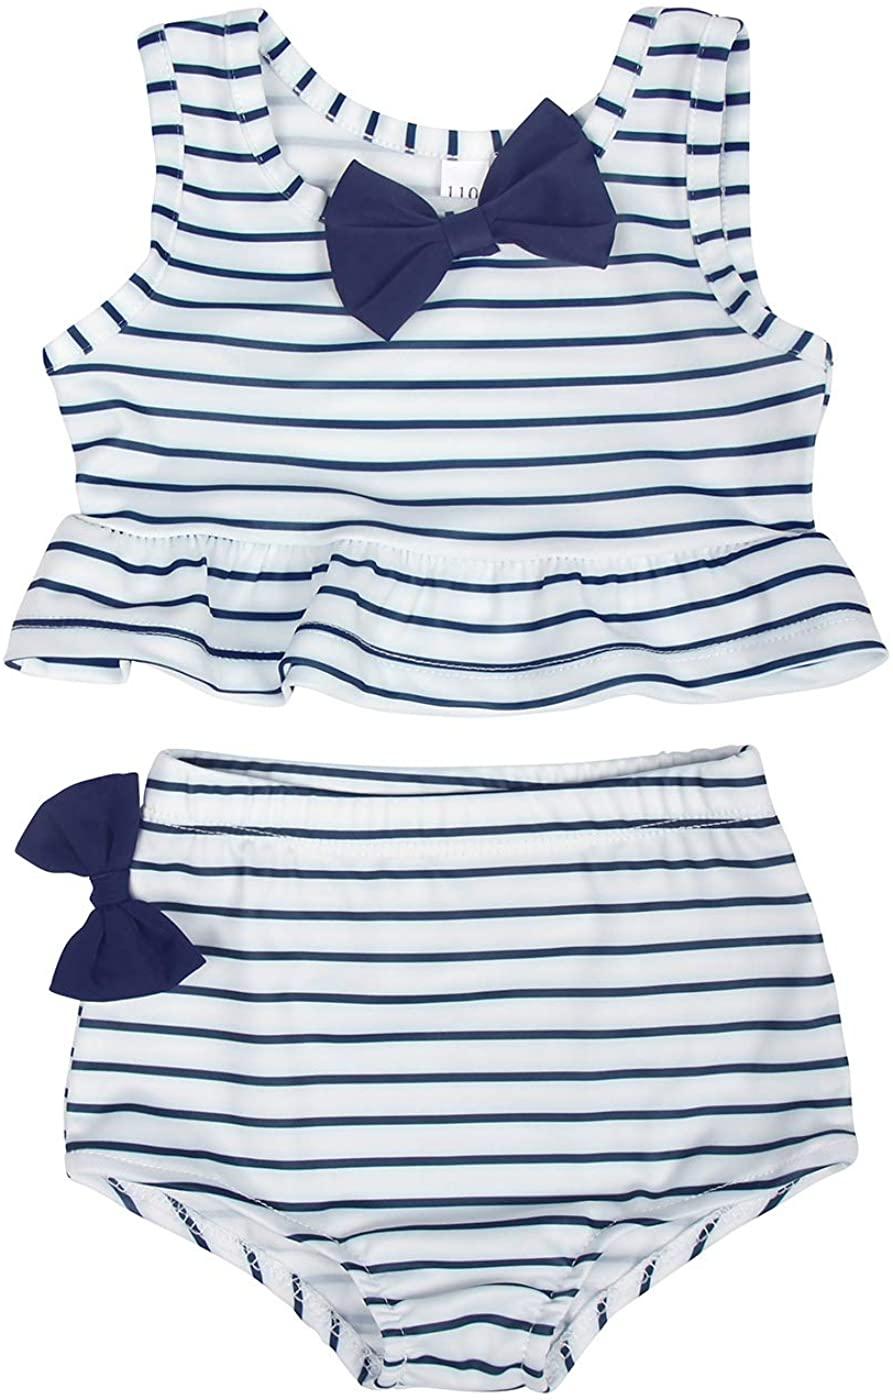 Jurebecia Baby Girl Bikini Striped Beach Swimsuit Ruffles Bathing Suit Adjustable Swimwear 2 Pieces Set 0-4 Years